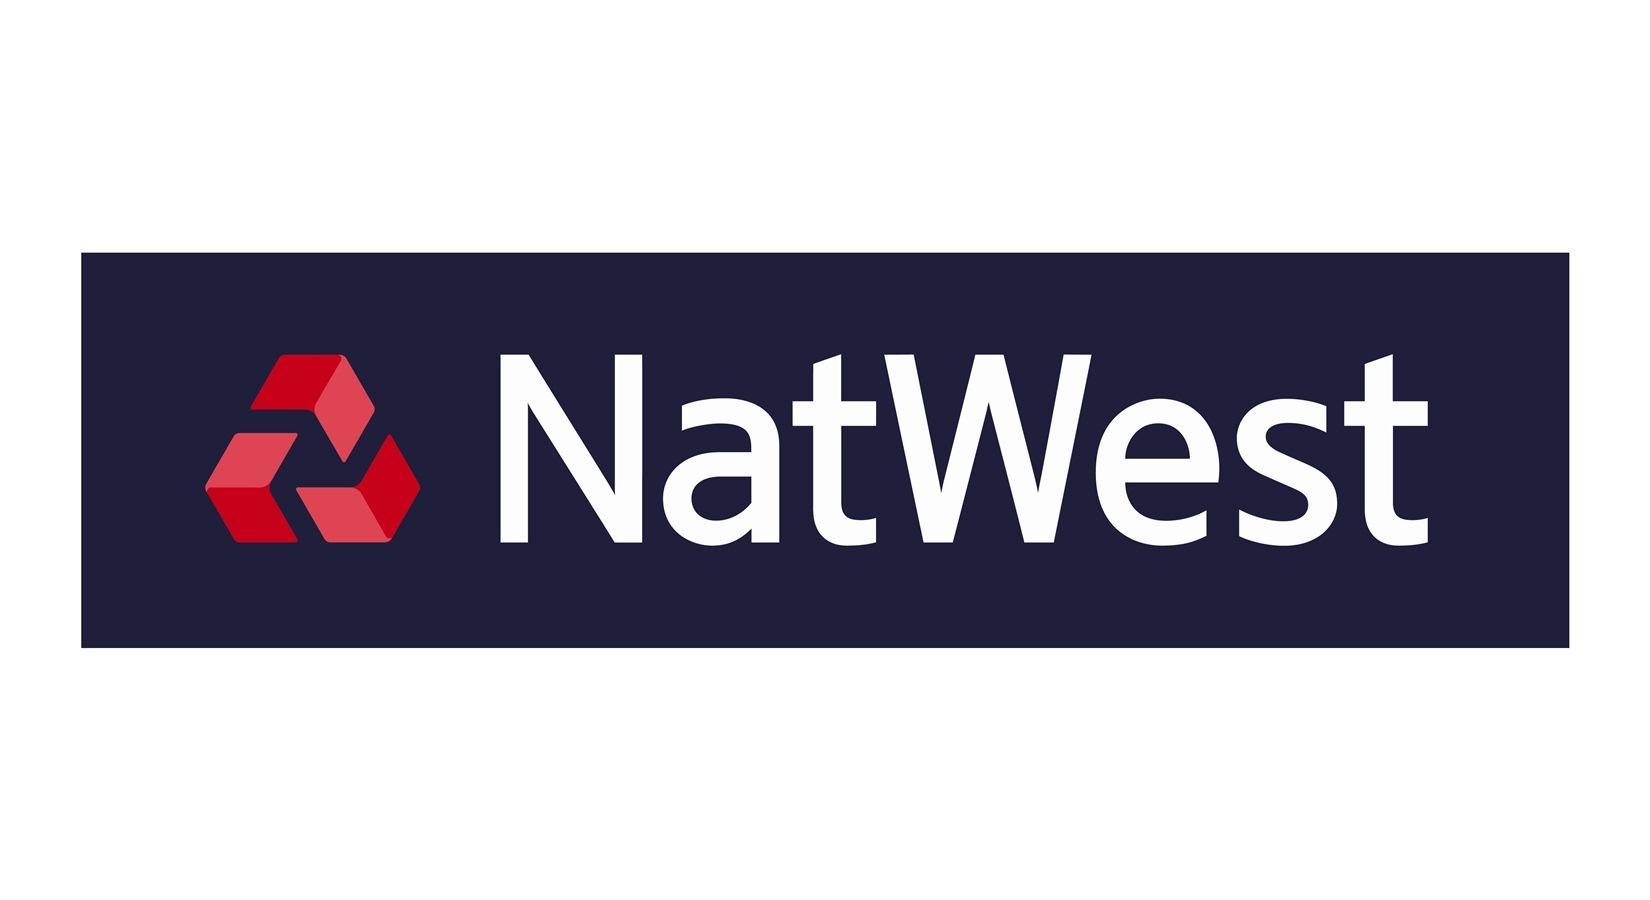 Natwest business plan